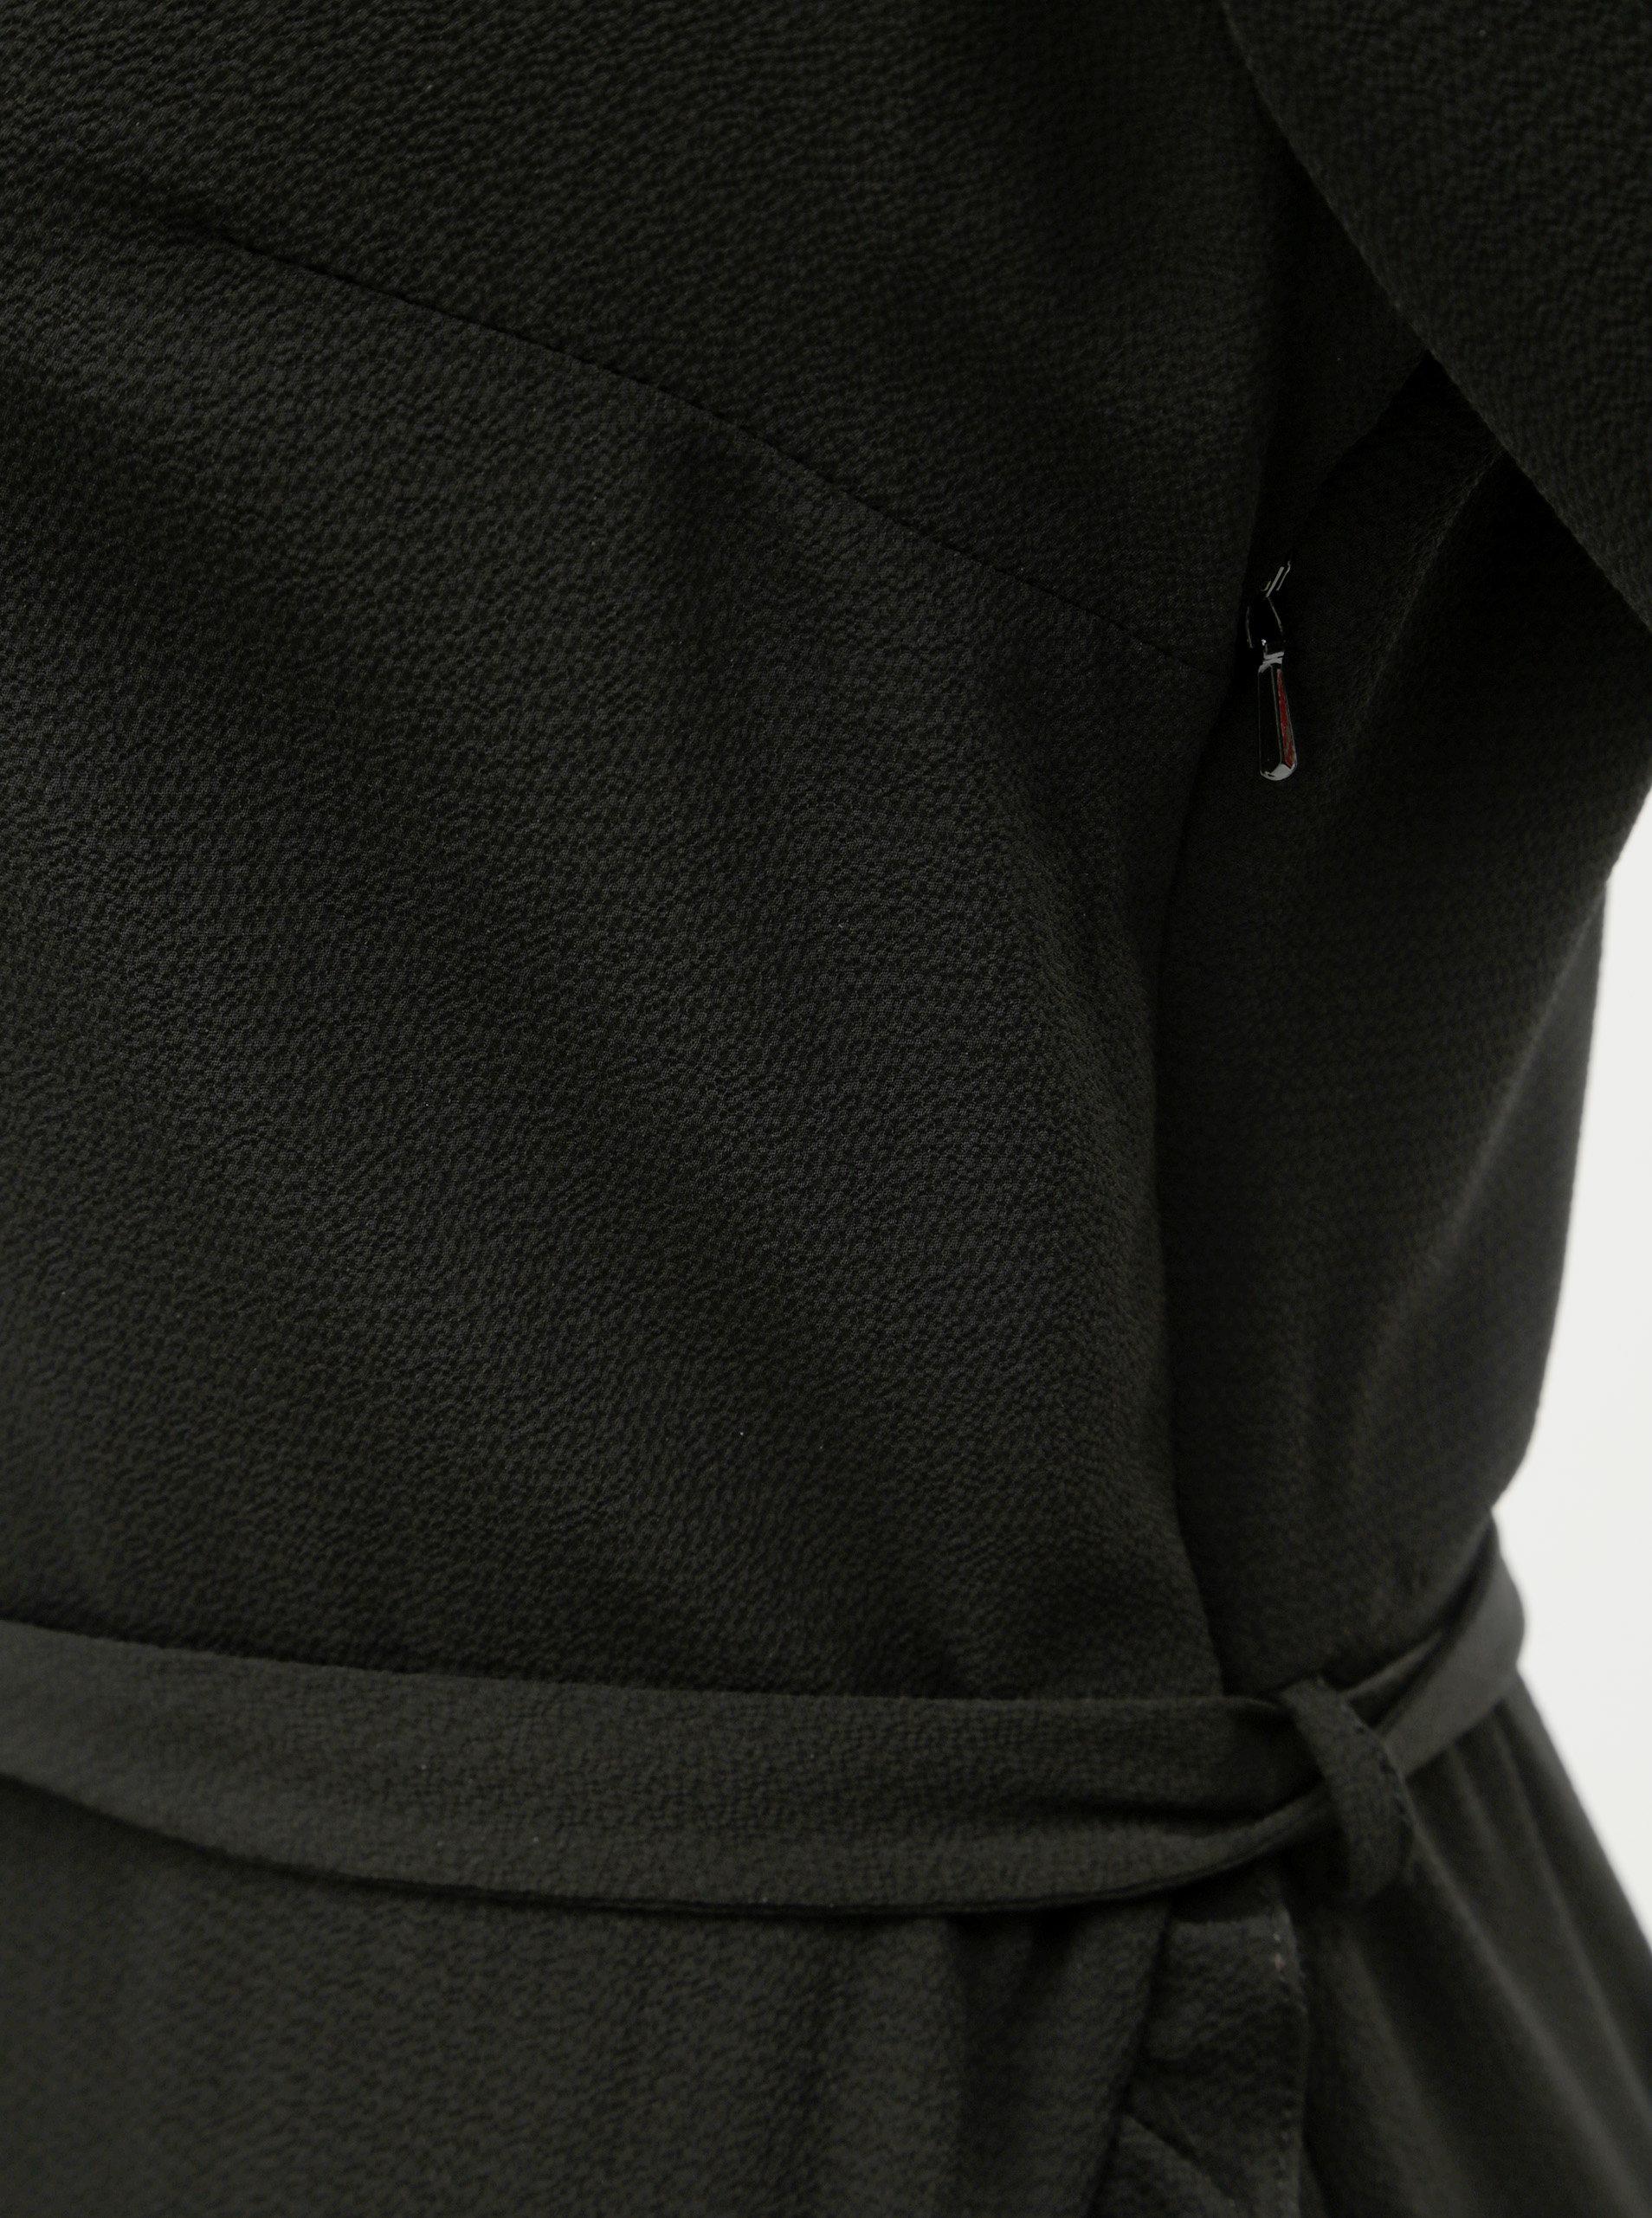 c23b438ffe5 Čierne šaty s volánom Dorothy Perkins ...